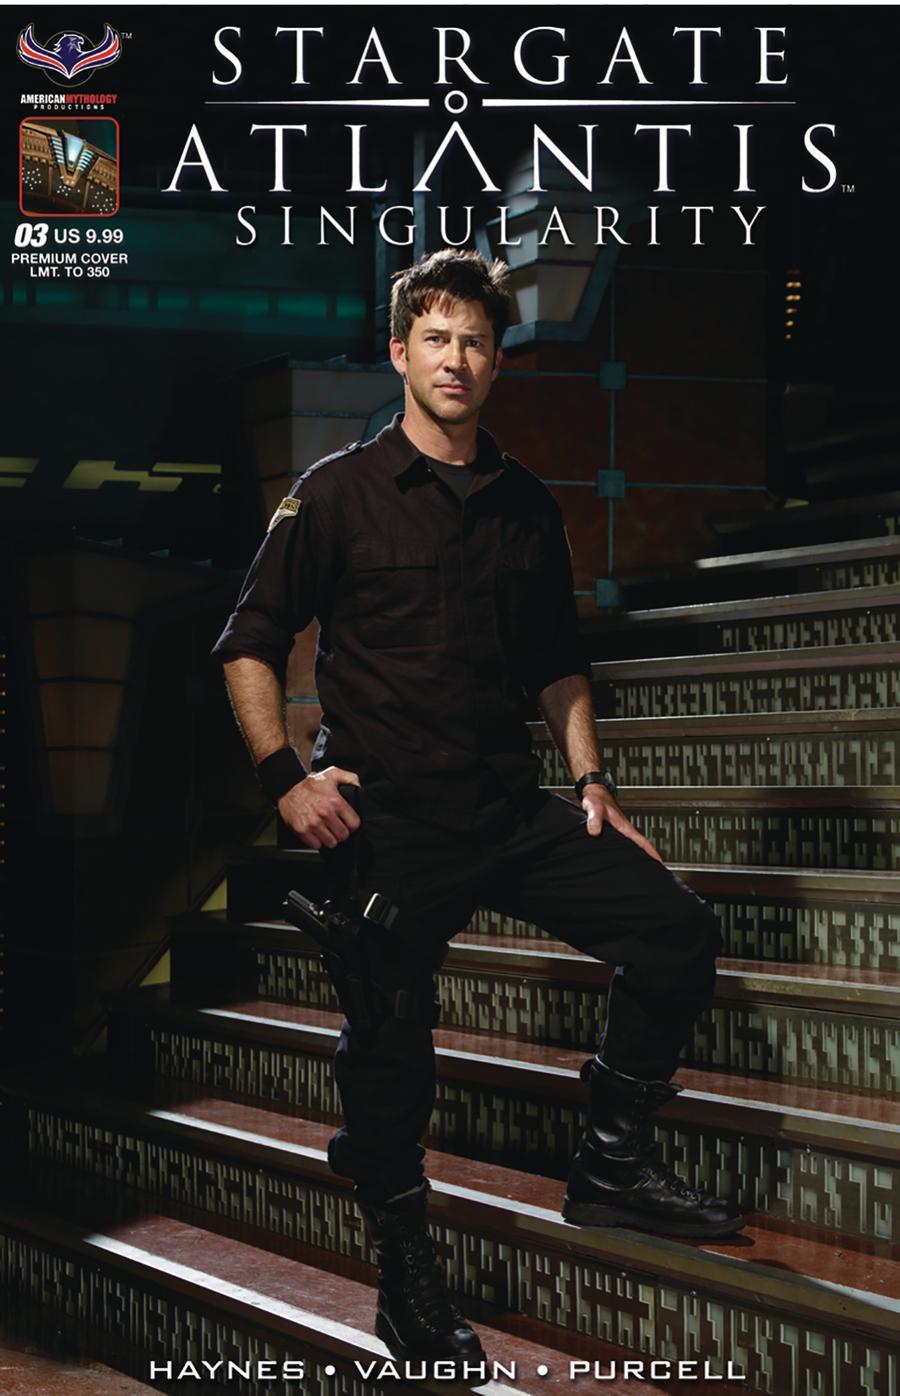 Stargate Atlantis Singularity #3 Cover C Variant Premium Flashback Photo Limited Edition Cover